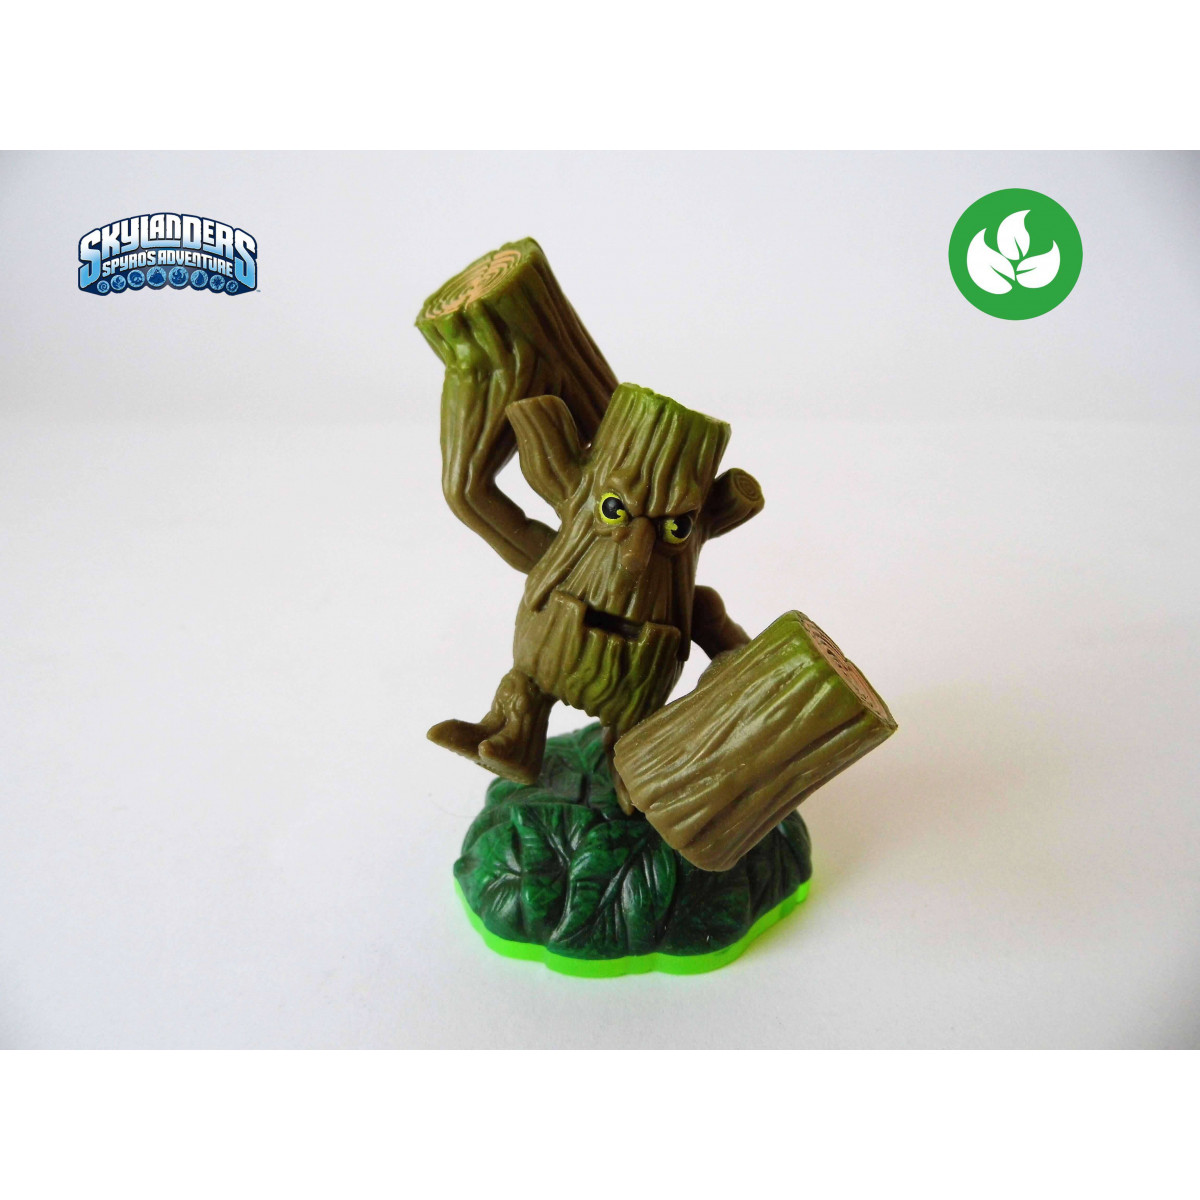 Skylanders Spyro's Adventure - Stump Smash játékfigura